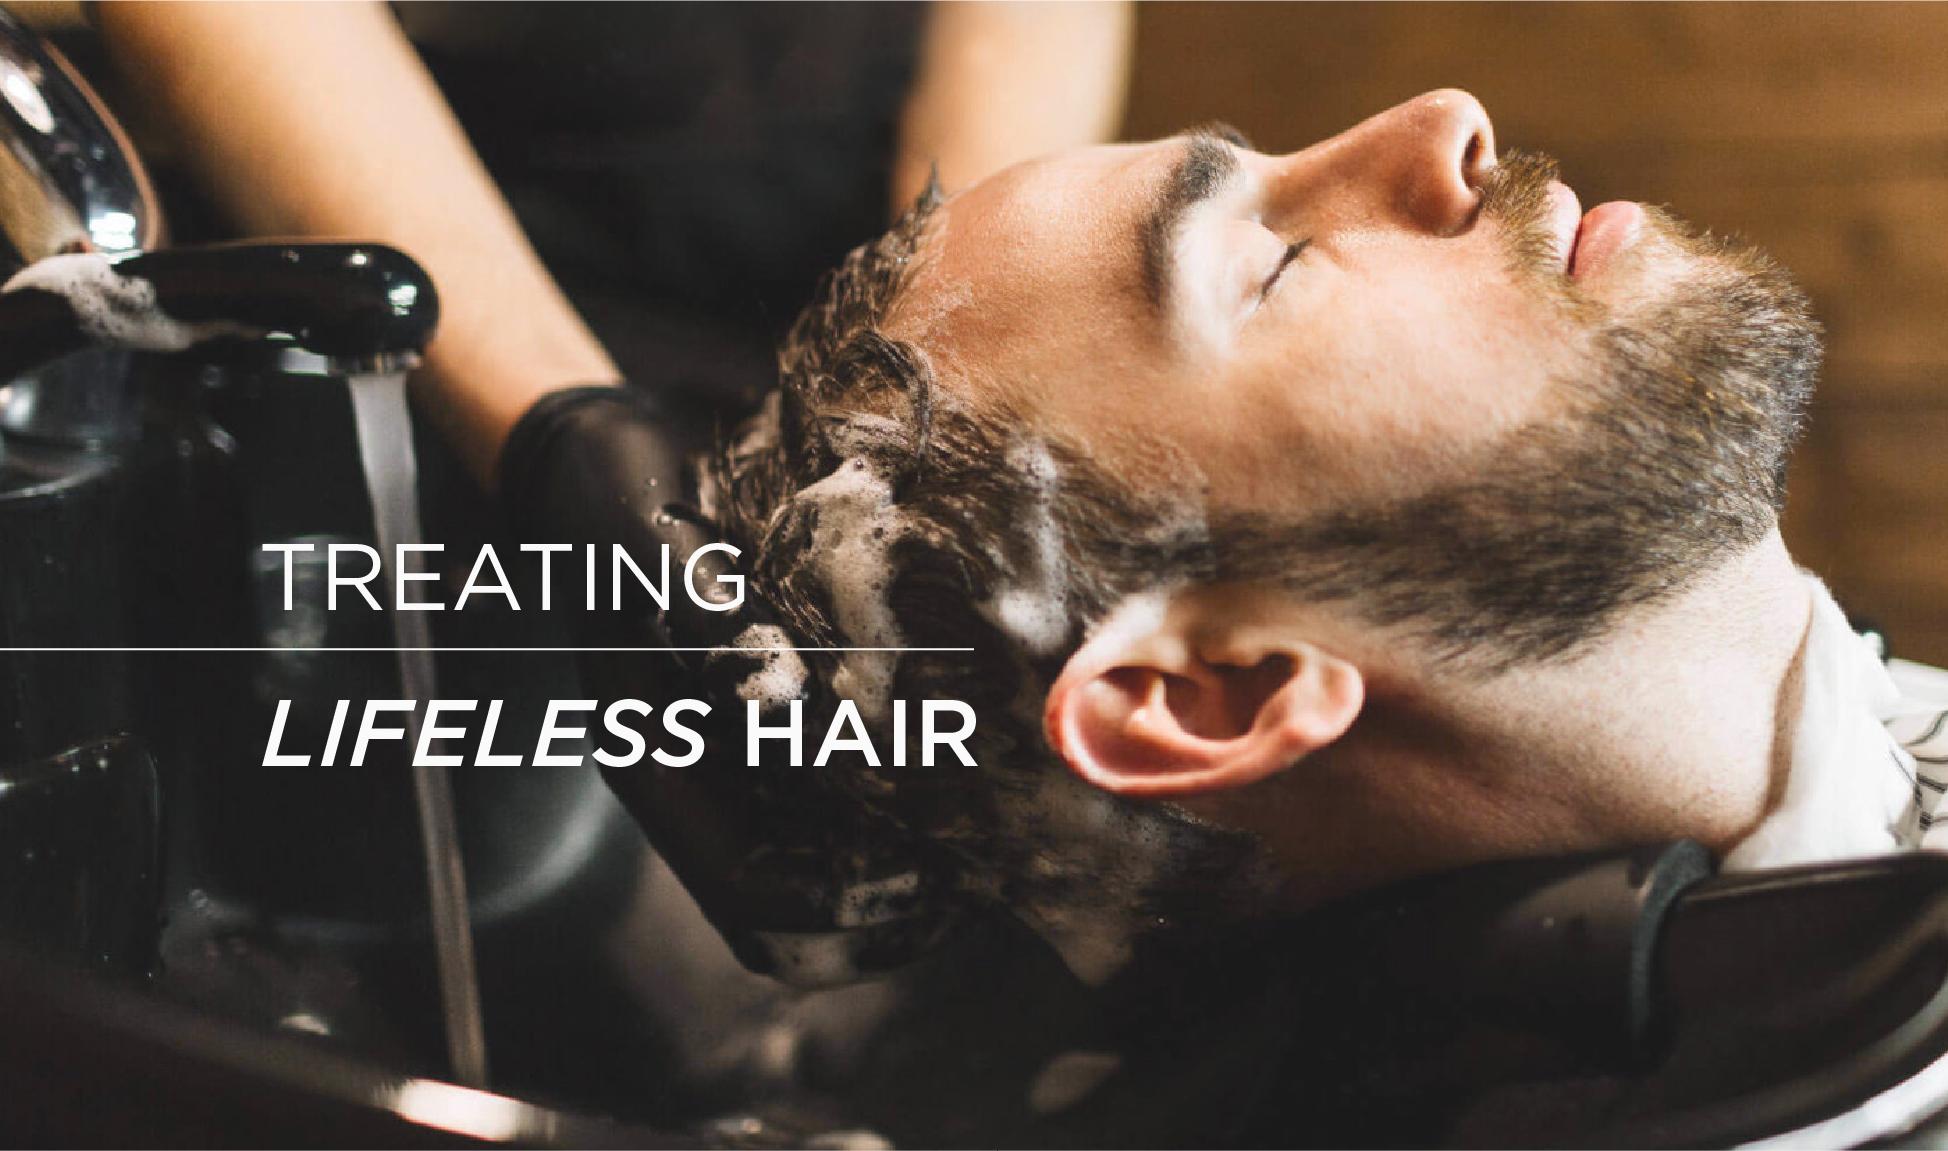 Clarifying shampoo for lifeless hair